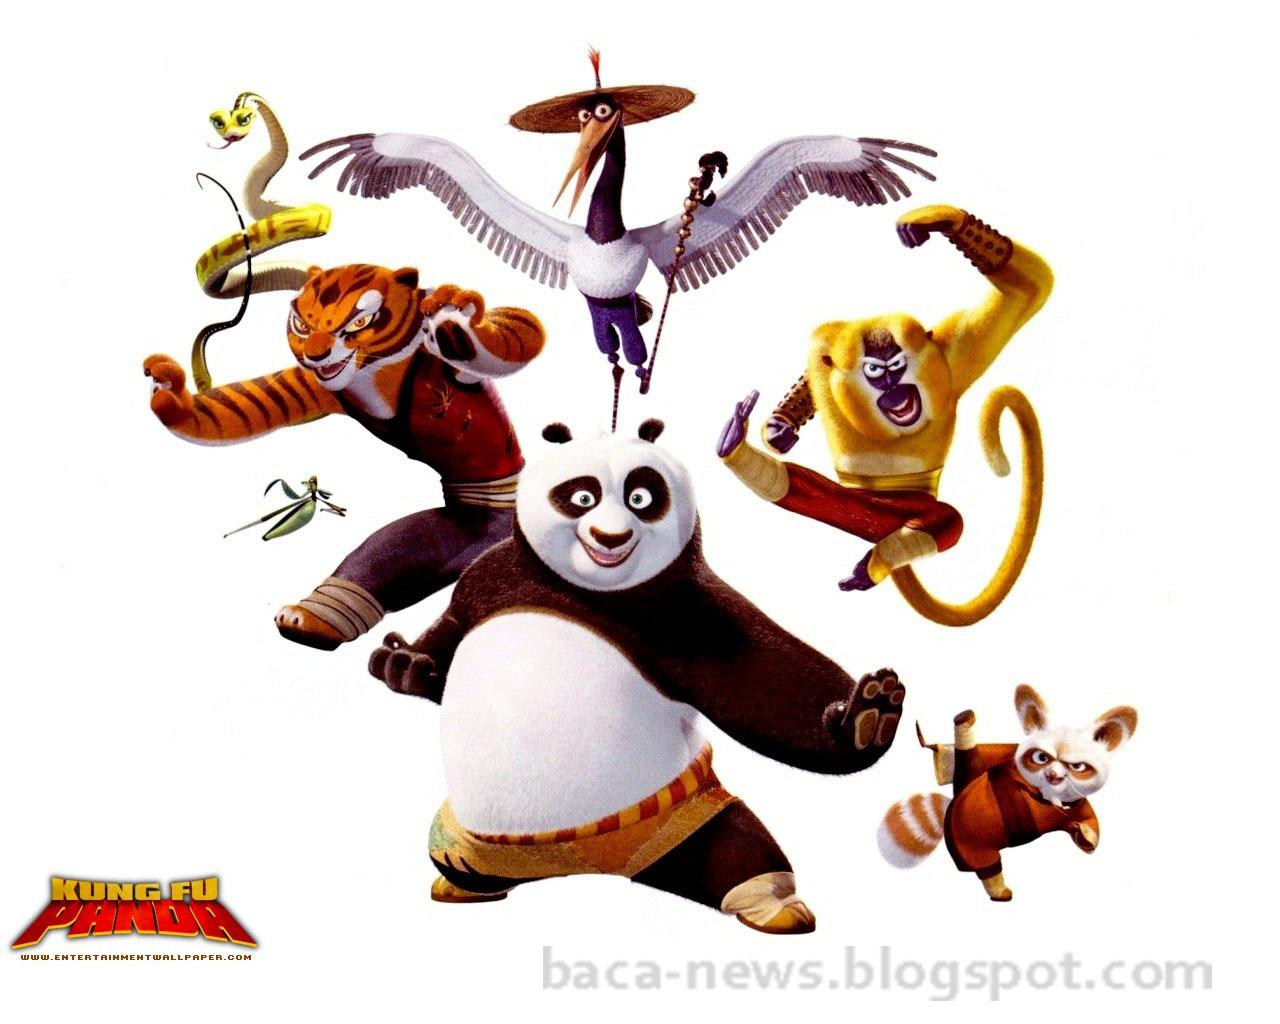 http://3.bp.blogspot.com/__-wvstXkkNo/TSWNX4Sqr_I/AAAAAAAAASE/XKmKEsrdIyk/s1600/Film+2011+-+10+Film+Spektakuler+2011+-+Kungfu+Panda+2.jpg